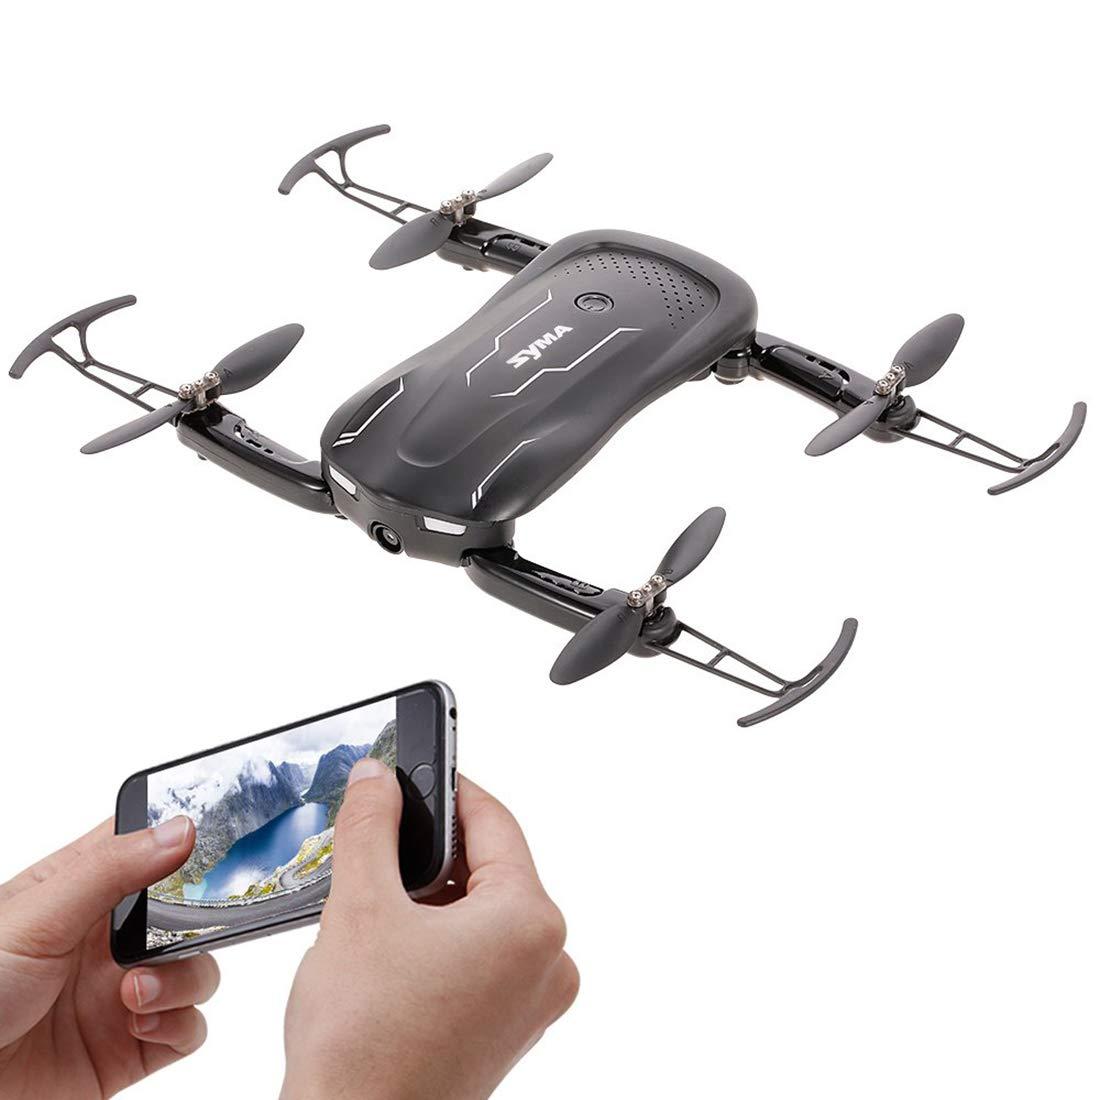 Syma Z1 R/C Foldable Selfie Drone